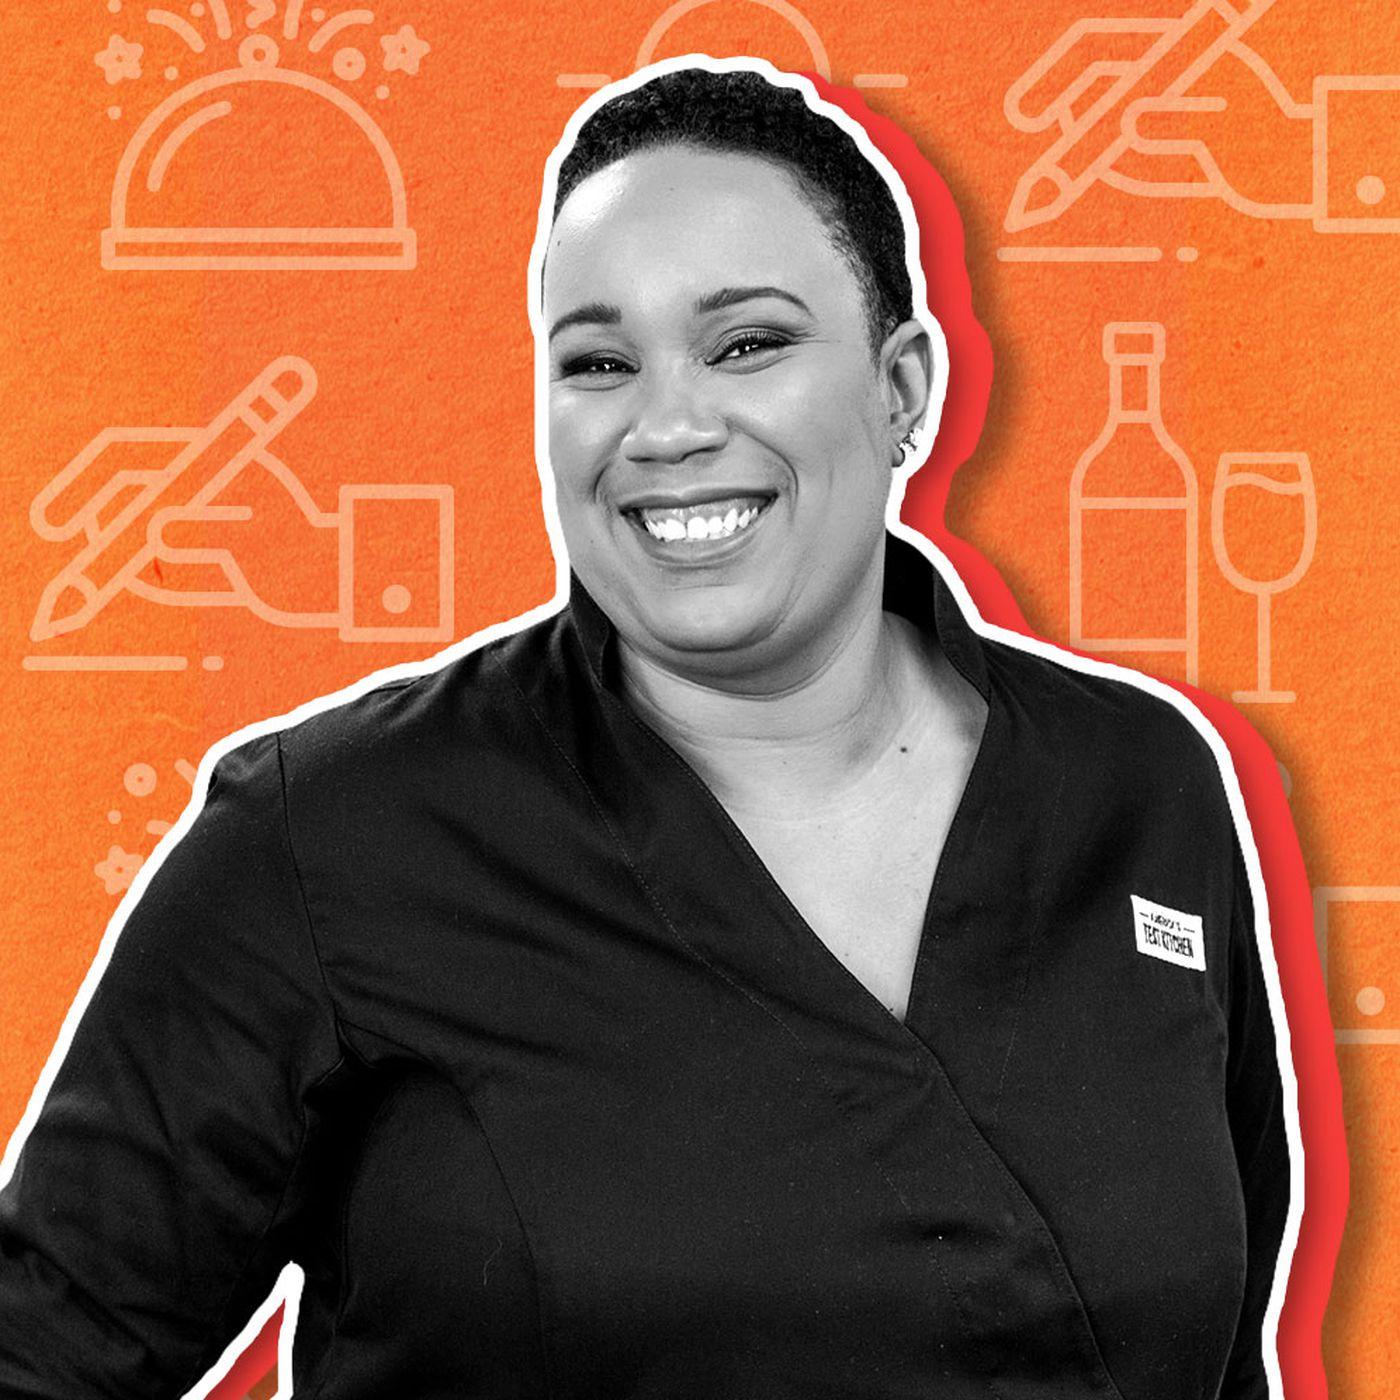 How America S Test Kitchen Star Food Stylist Elle Simone Scott Got Her Job Eater